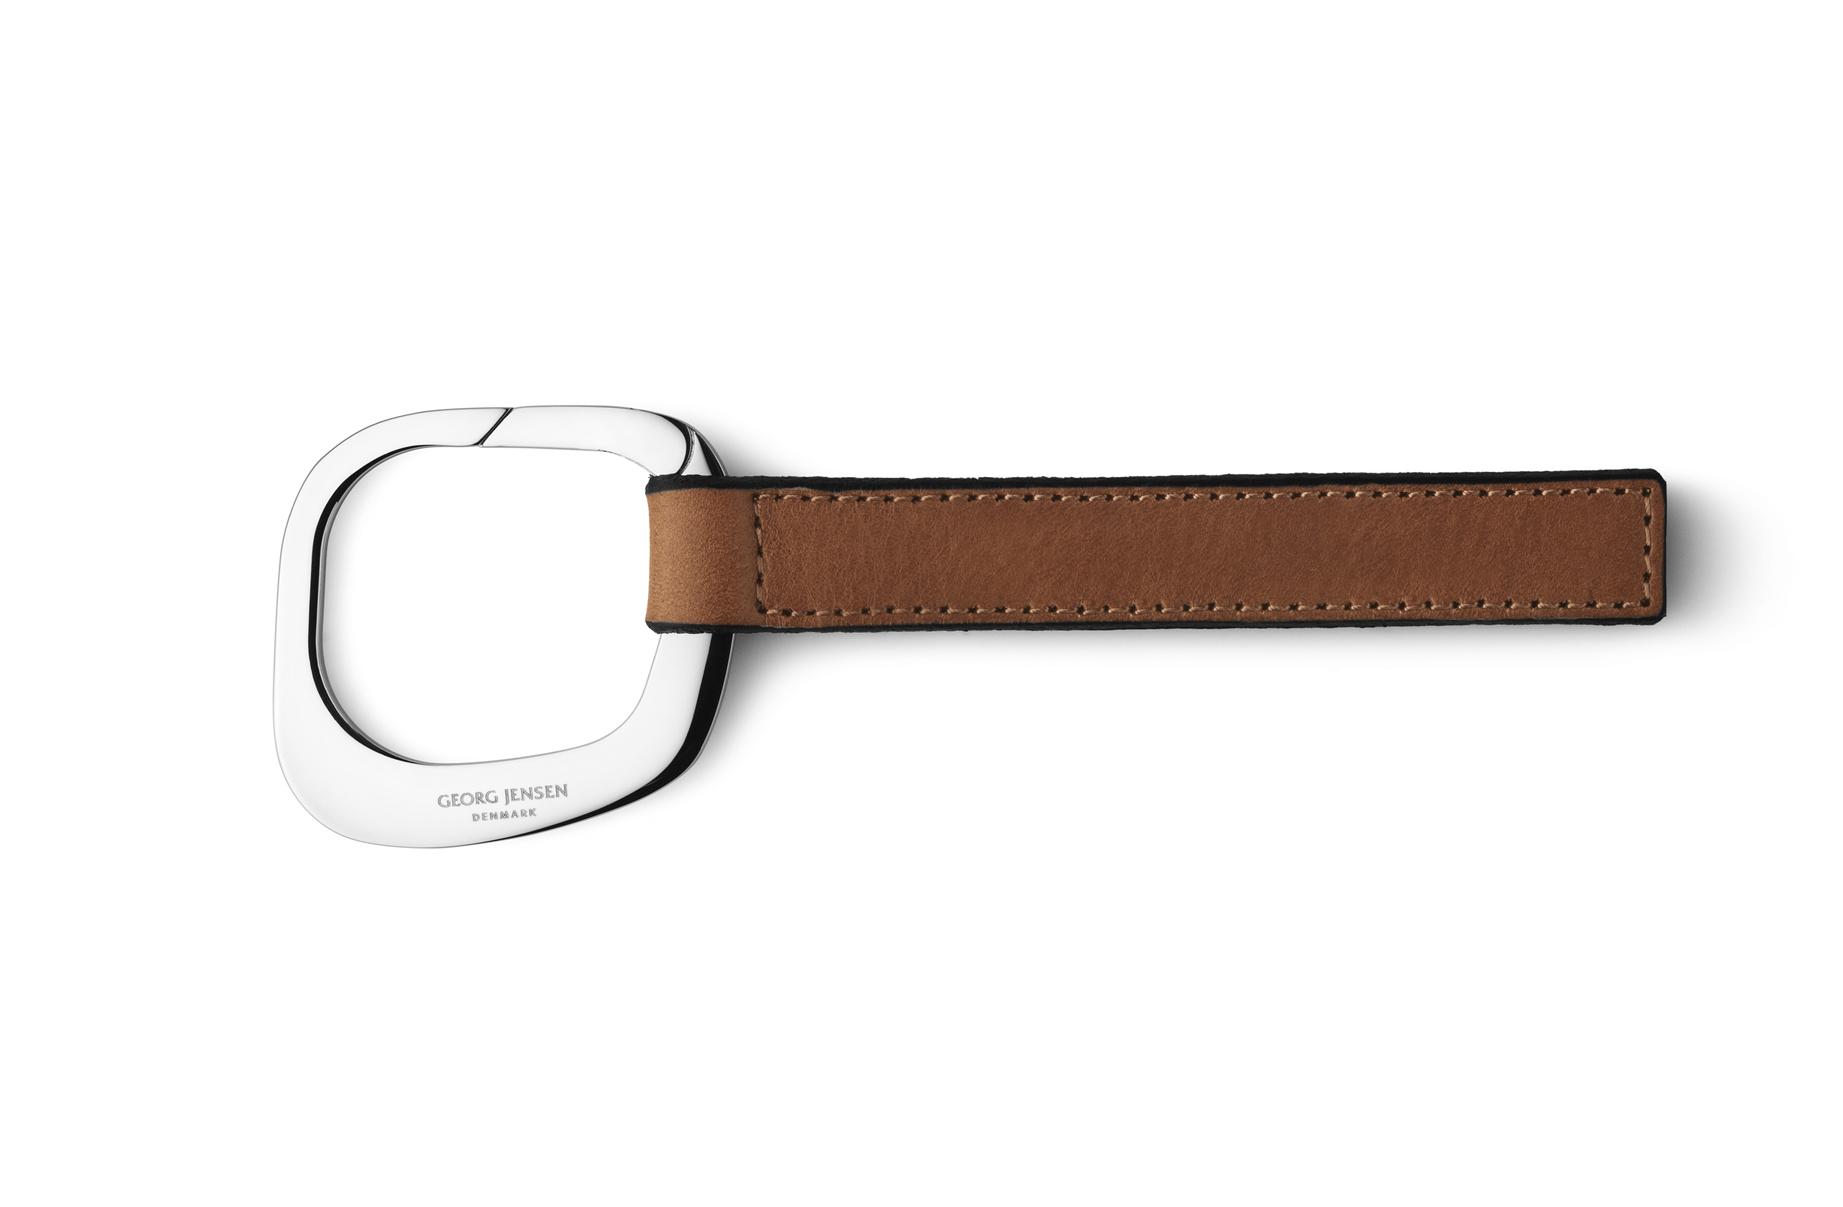 Accessories sleutelhanger vierkant